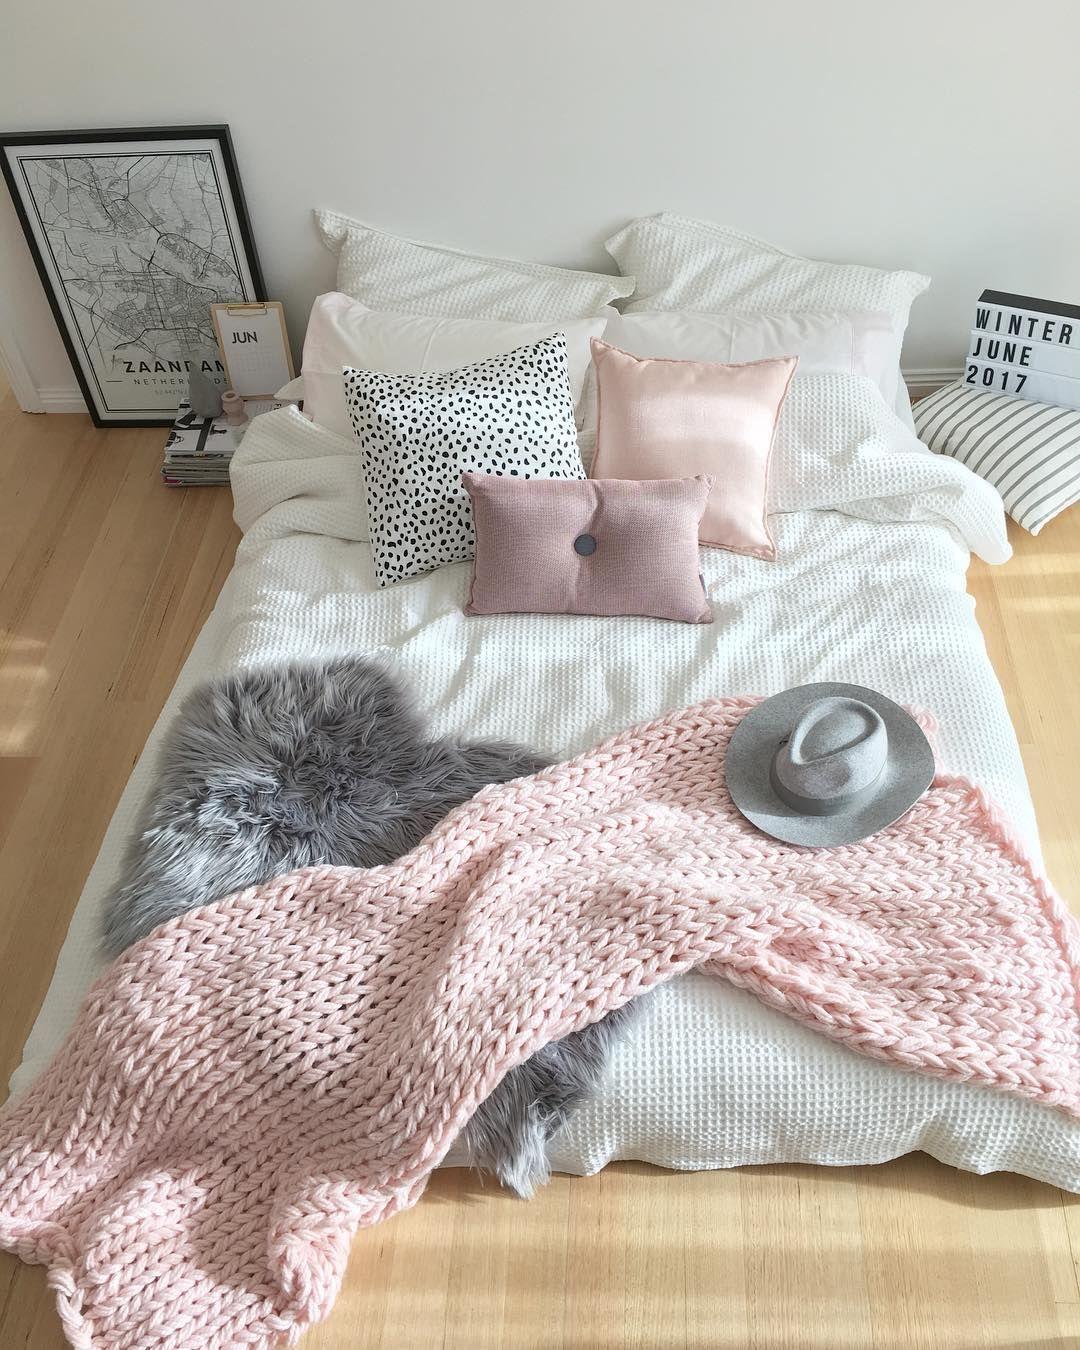 Stylingbytiffany On Instagram Scandinavian Bedroom Pink White And Grey Felt Hat Mapiful Girls Room Decor Scandinavian Bedroom Floor Bed